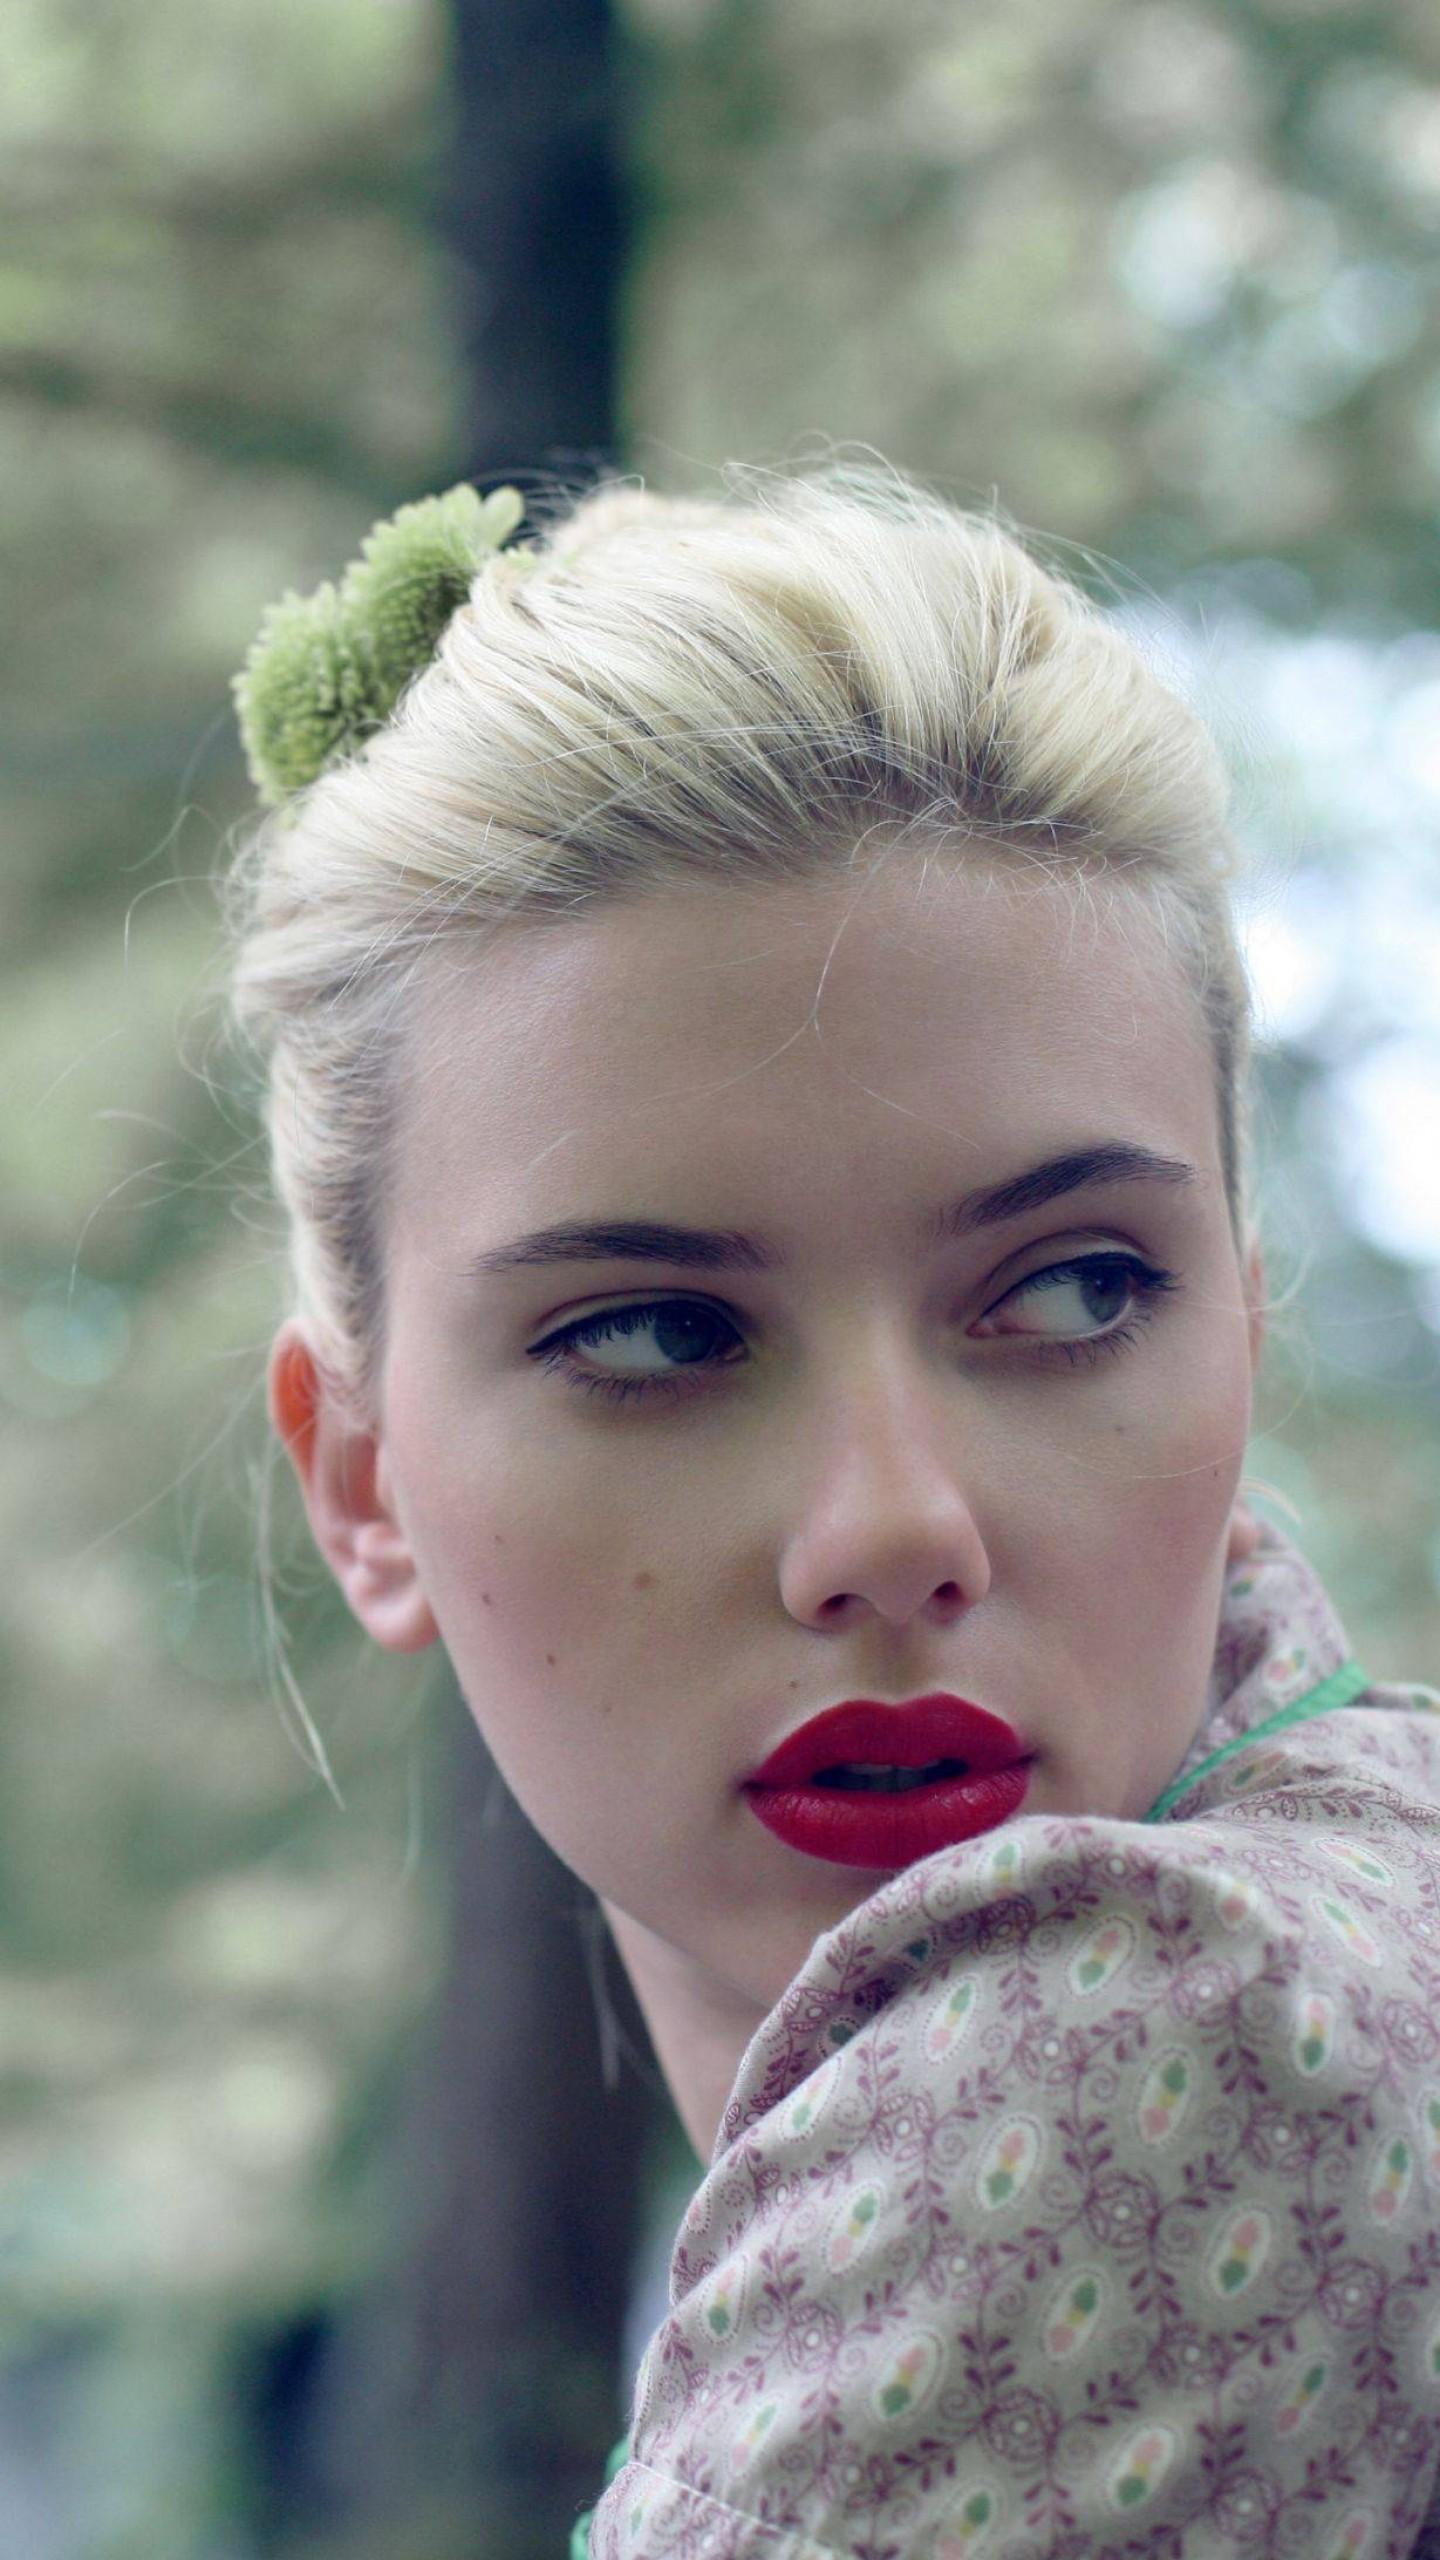 Wallpaper Scarlett Johansson, Most Popular Celebs, Actress